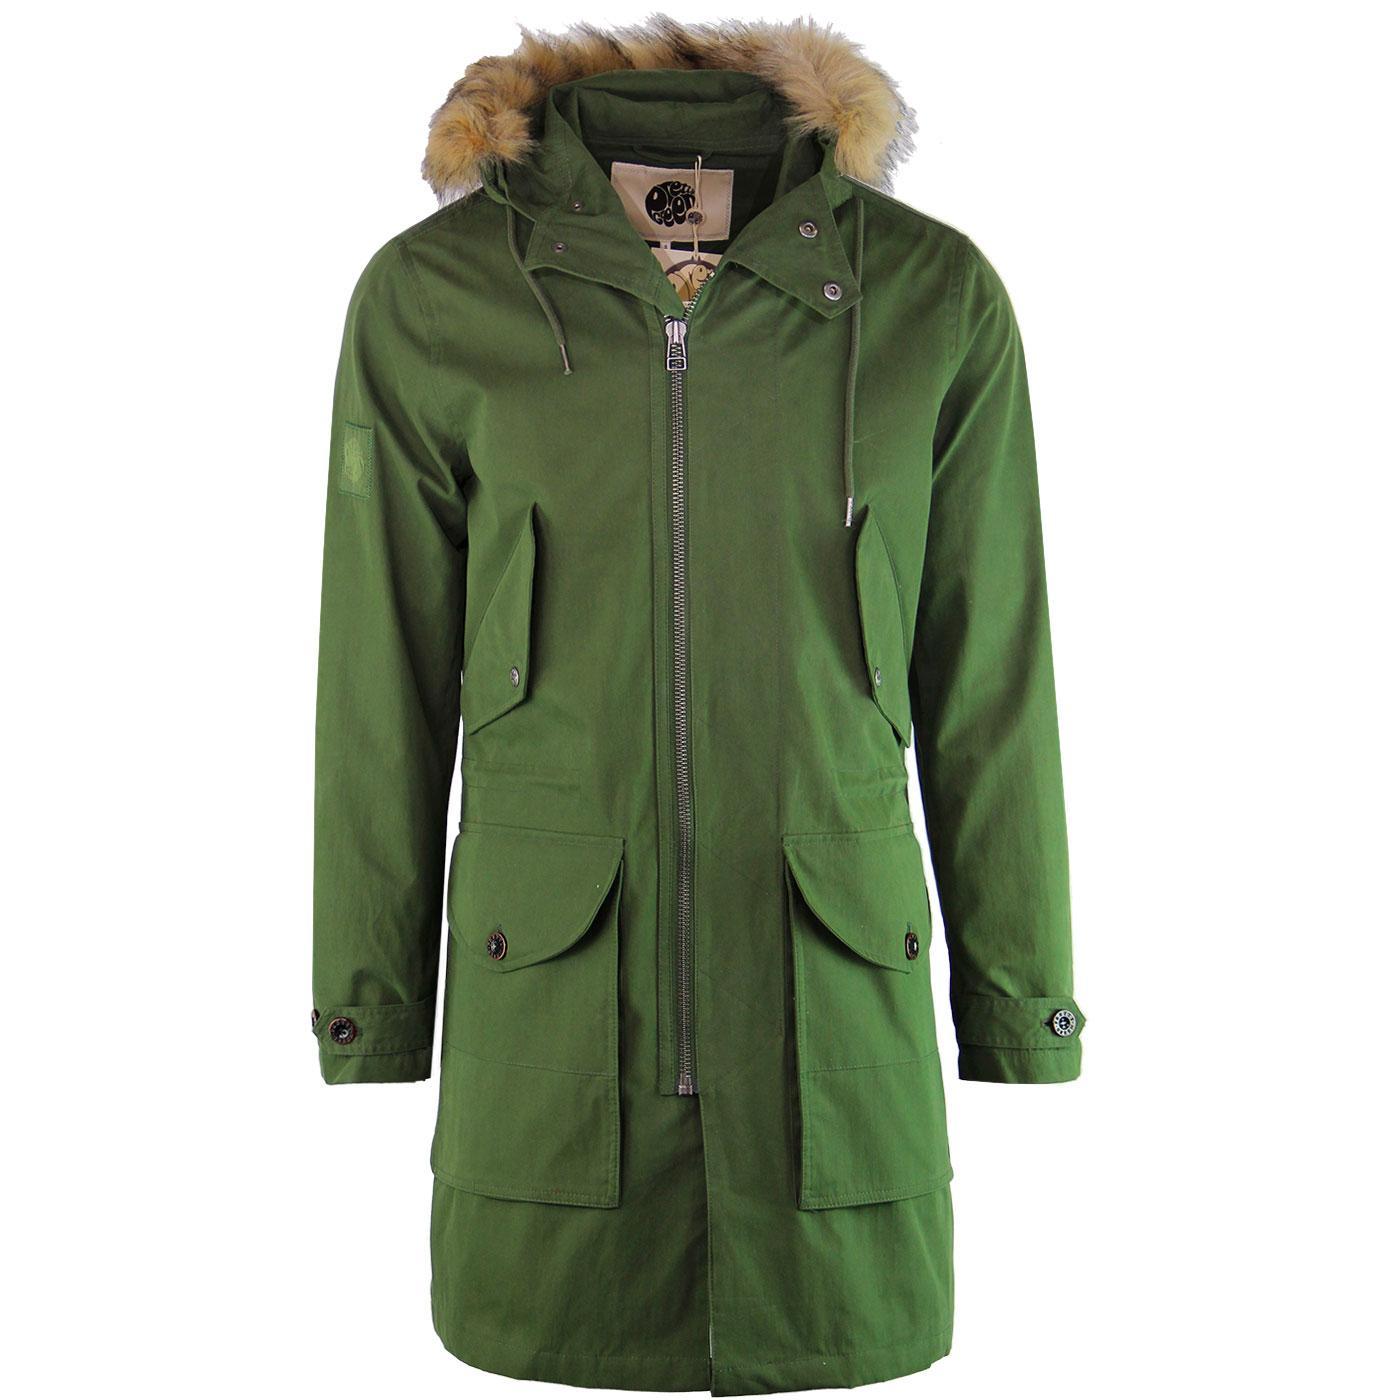 PRETTY GREEN 60s Mod Fur Trim Hooded Parka Jacket